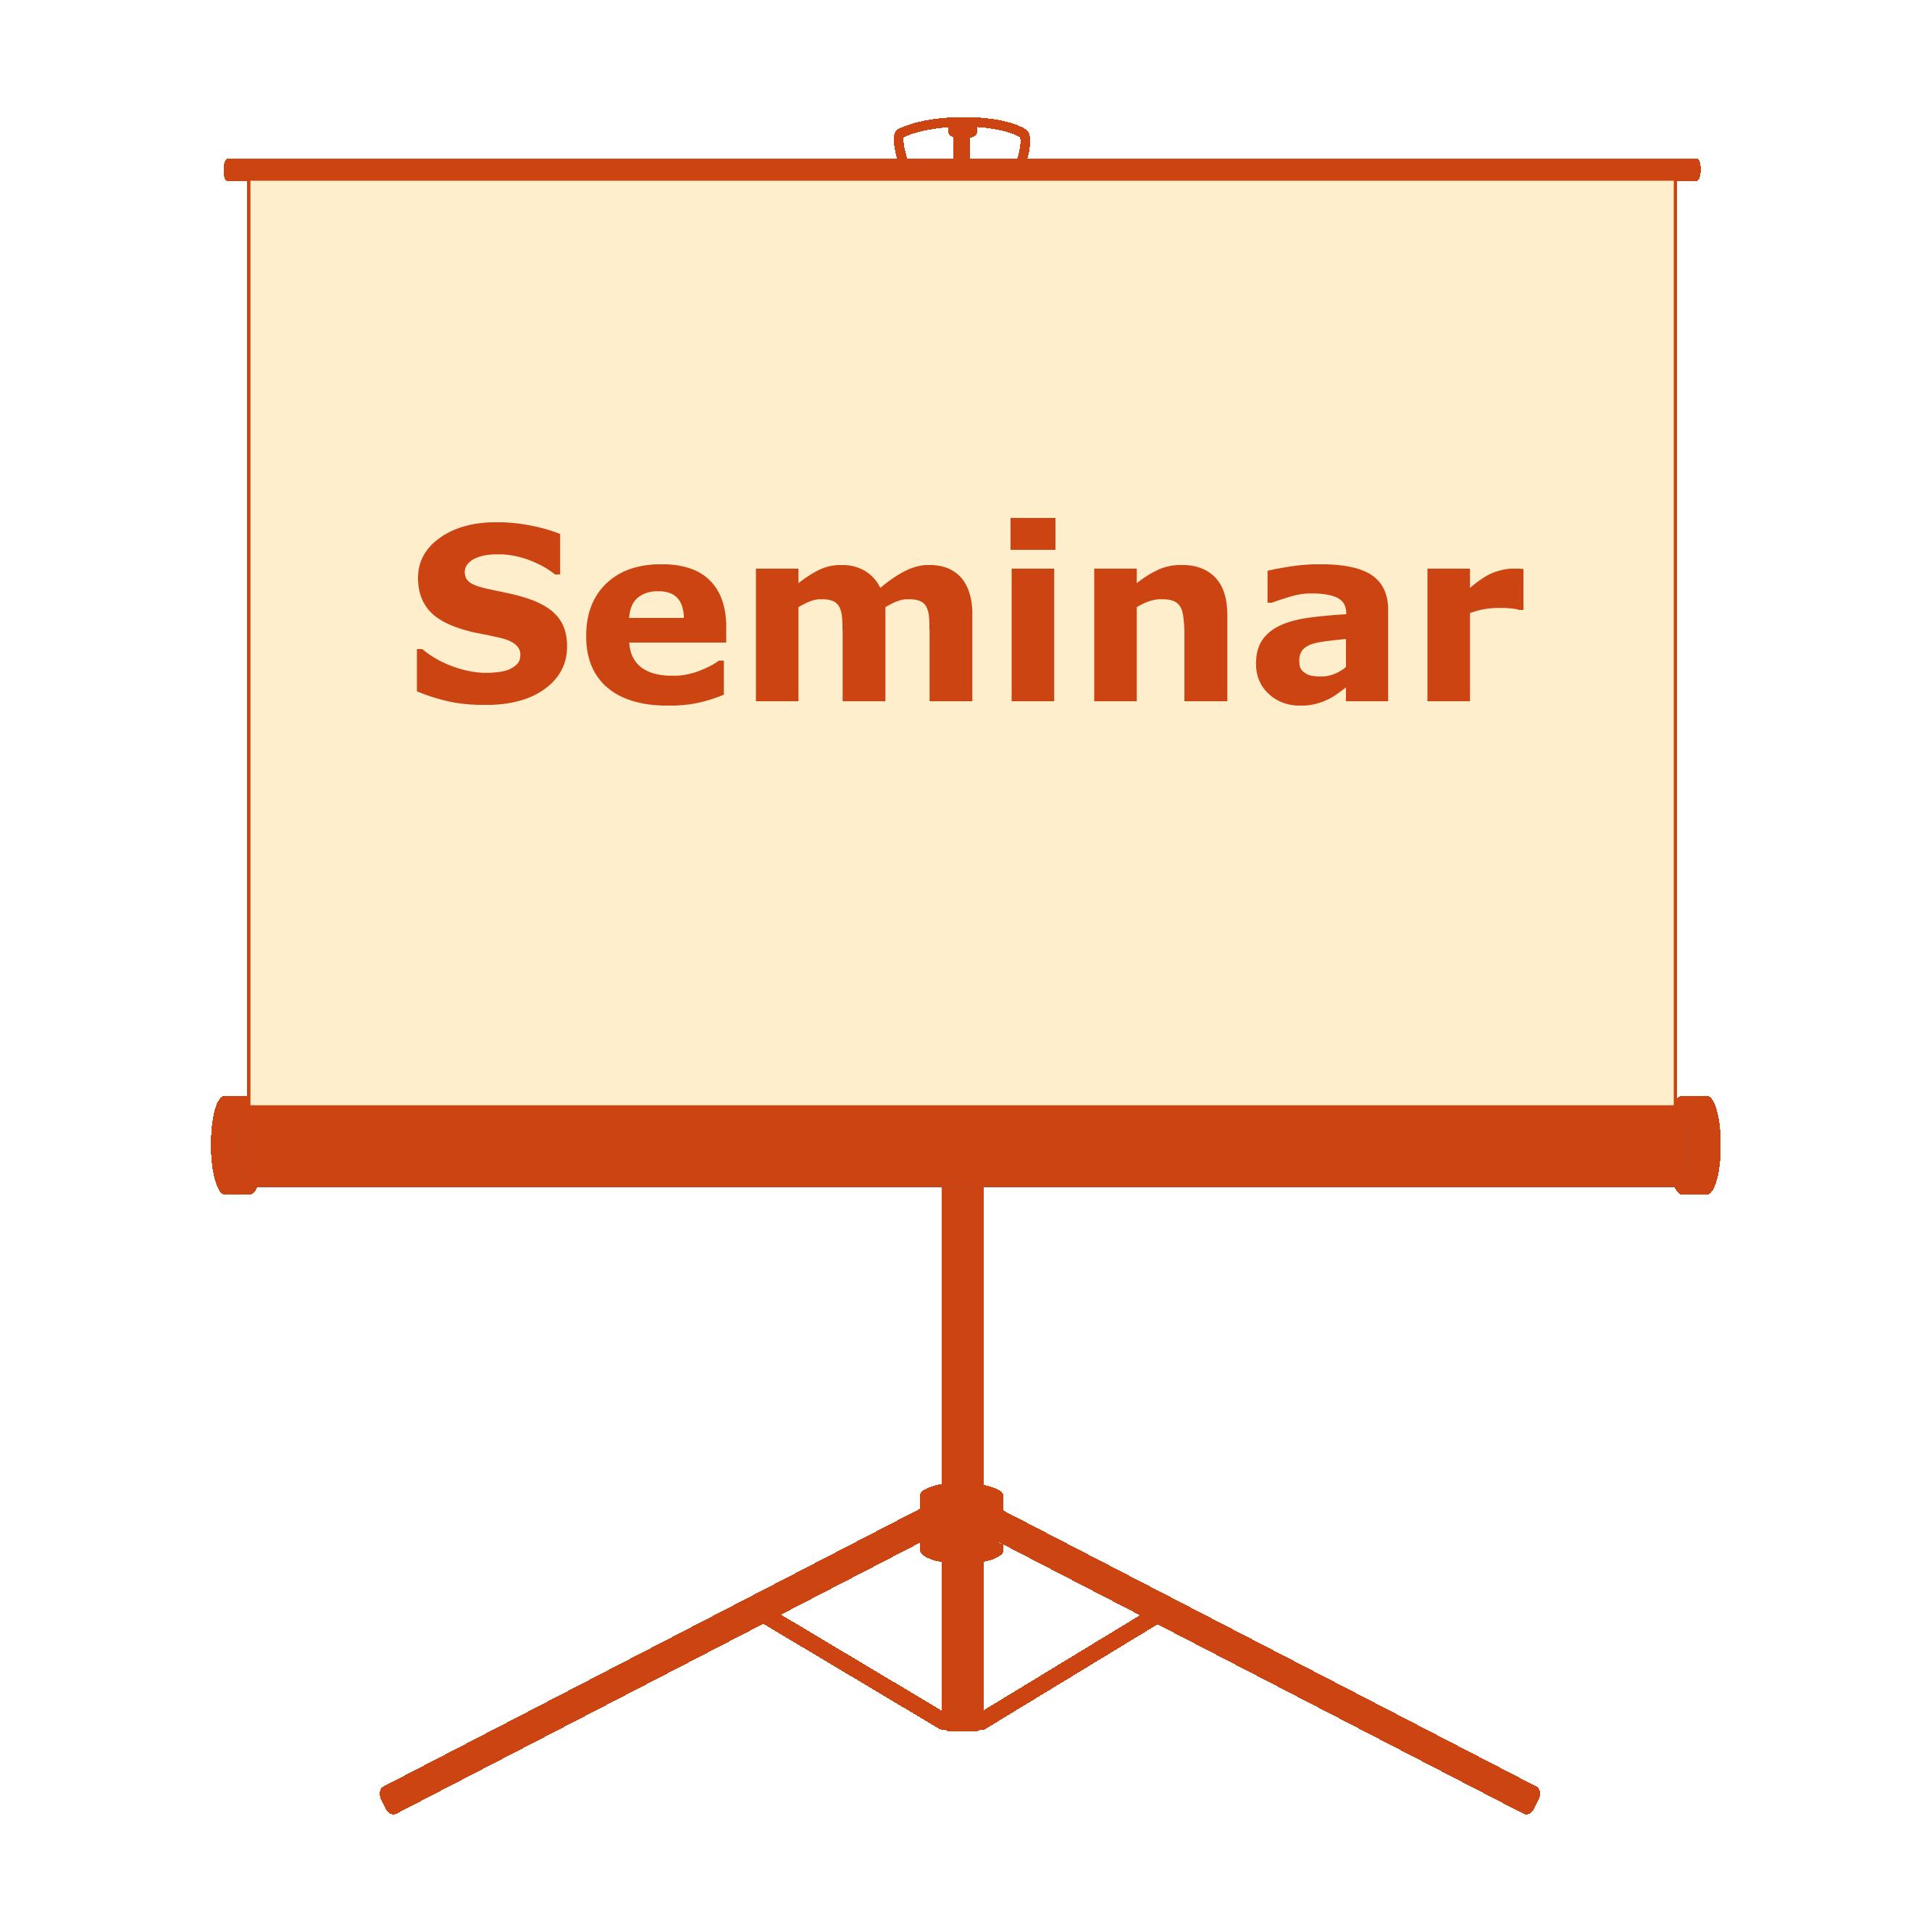 Seminar: VFD-Geländerittführer